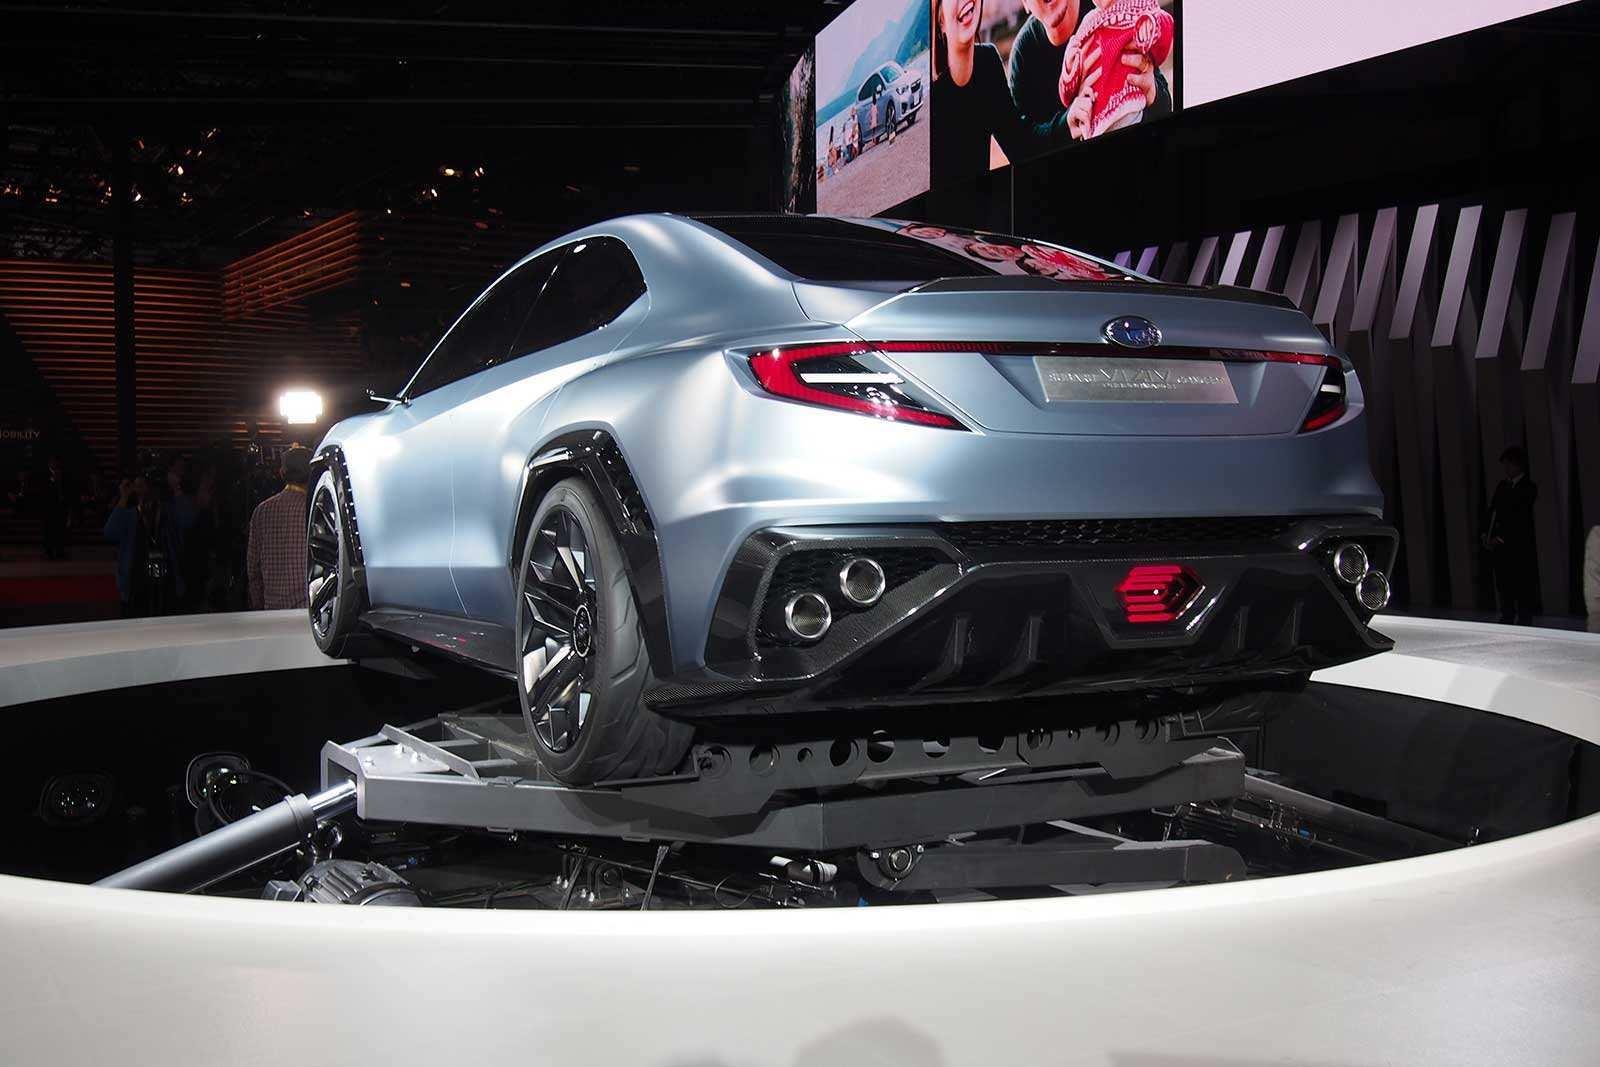 31 Concept of 2020 Subaru Sti Release Date Release Date for 2020 Subaru Sti Release Date